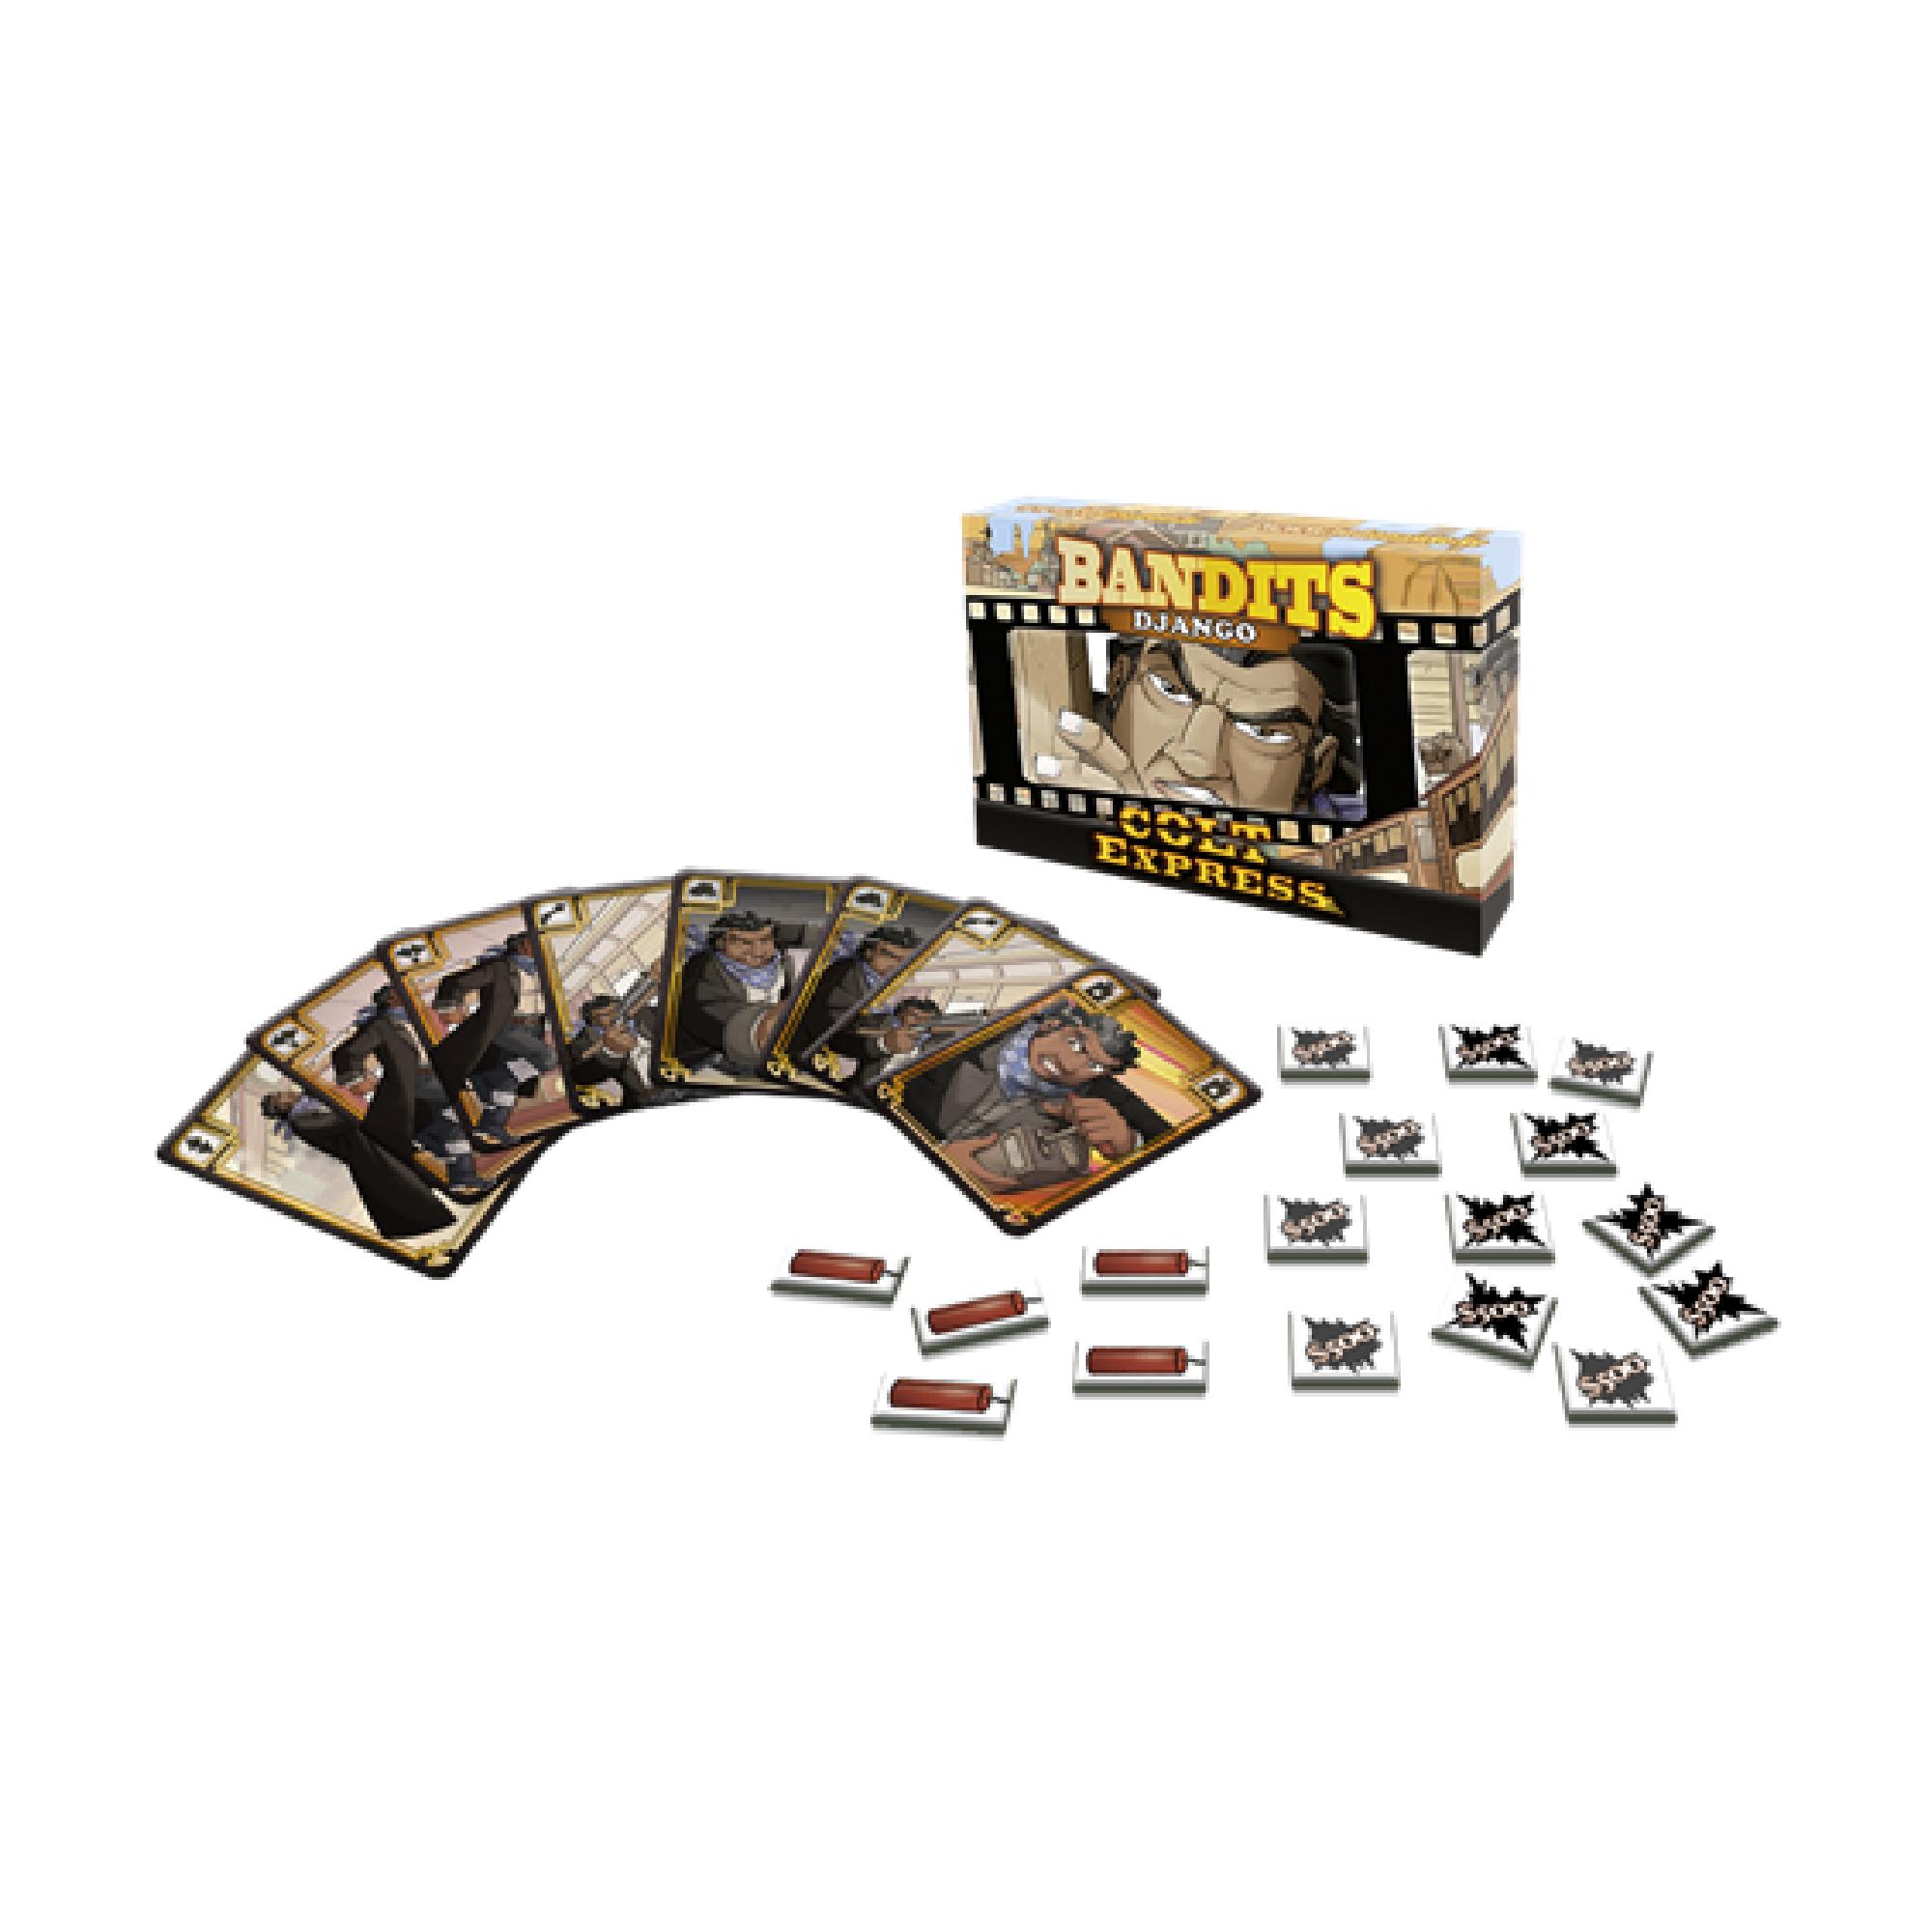 Ludonaute Colt Express Bandit Pack - Exp. Django